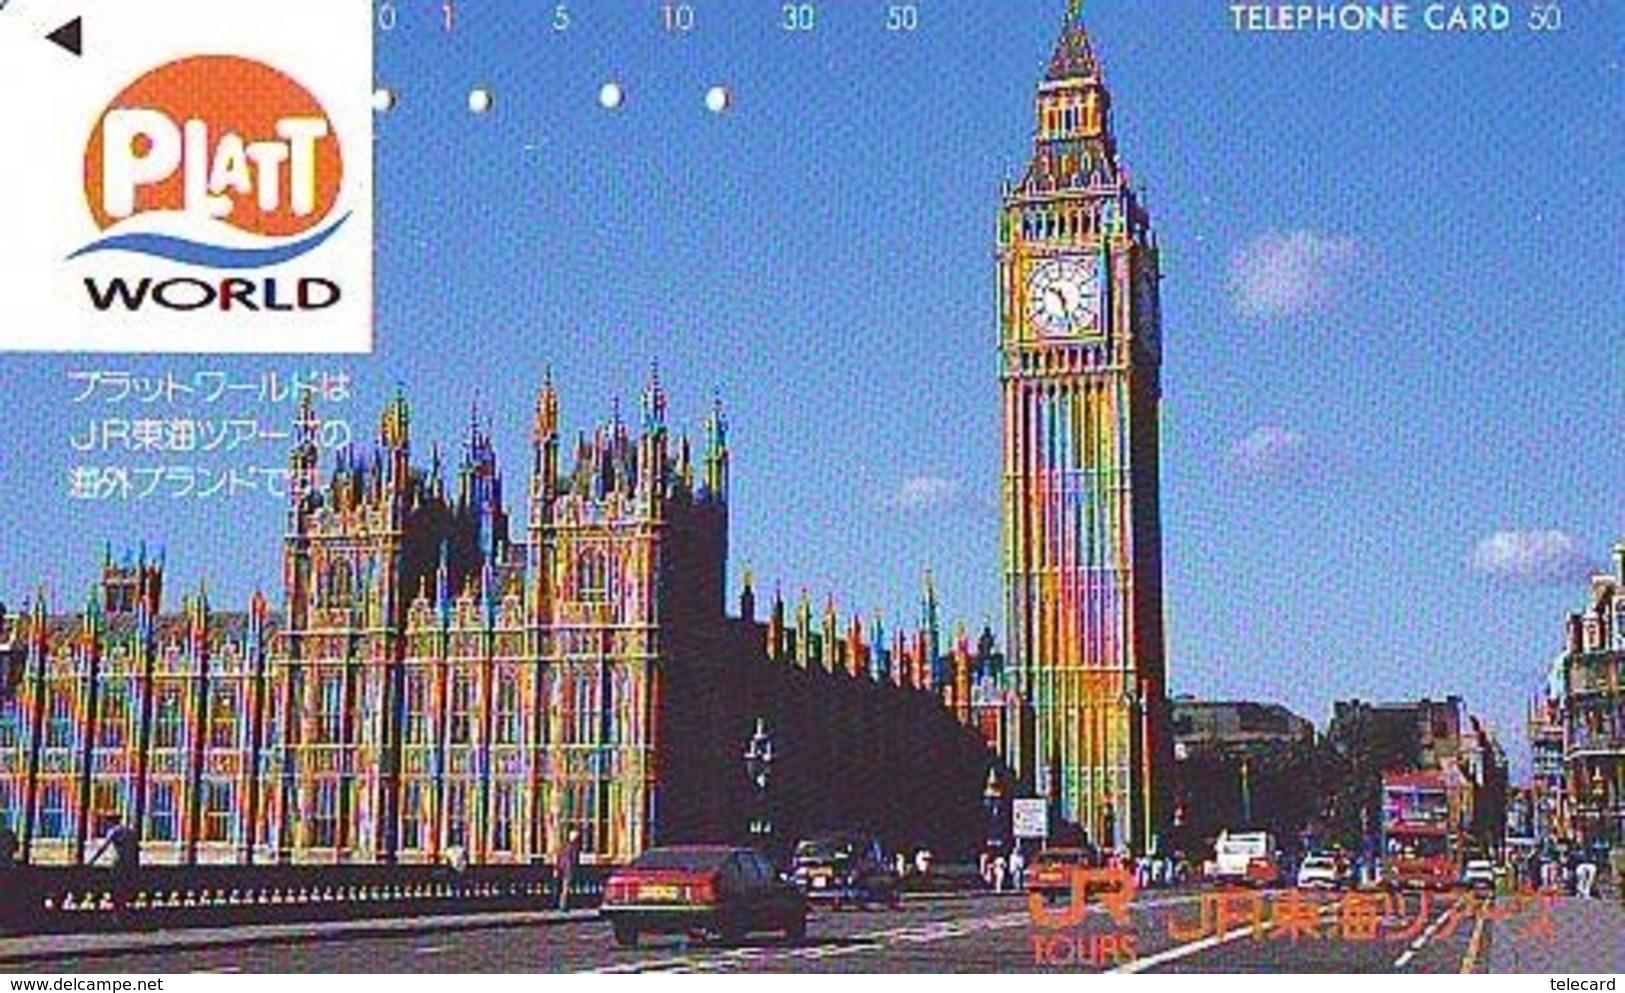 Télécarte Japon ANGLETERRE * ENGLAND *  LONDON * BIG BEN (350) GREAT BRITAIN Related *  Phonecard Japan * - Paysages